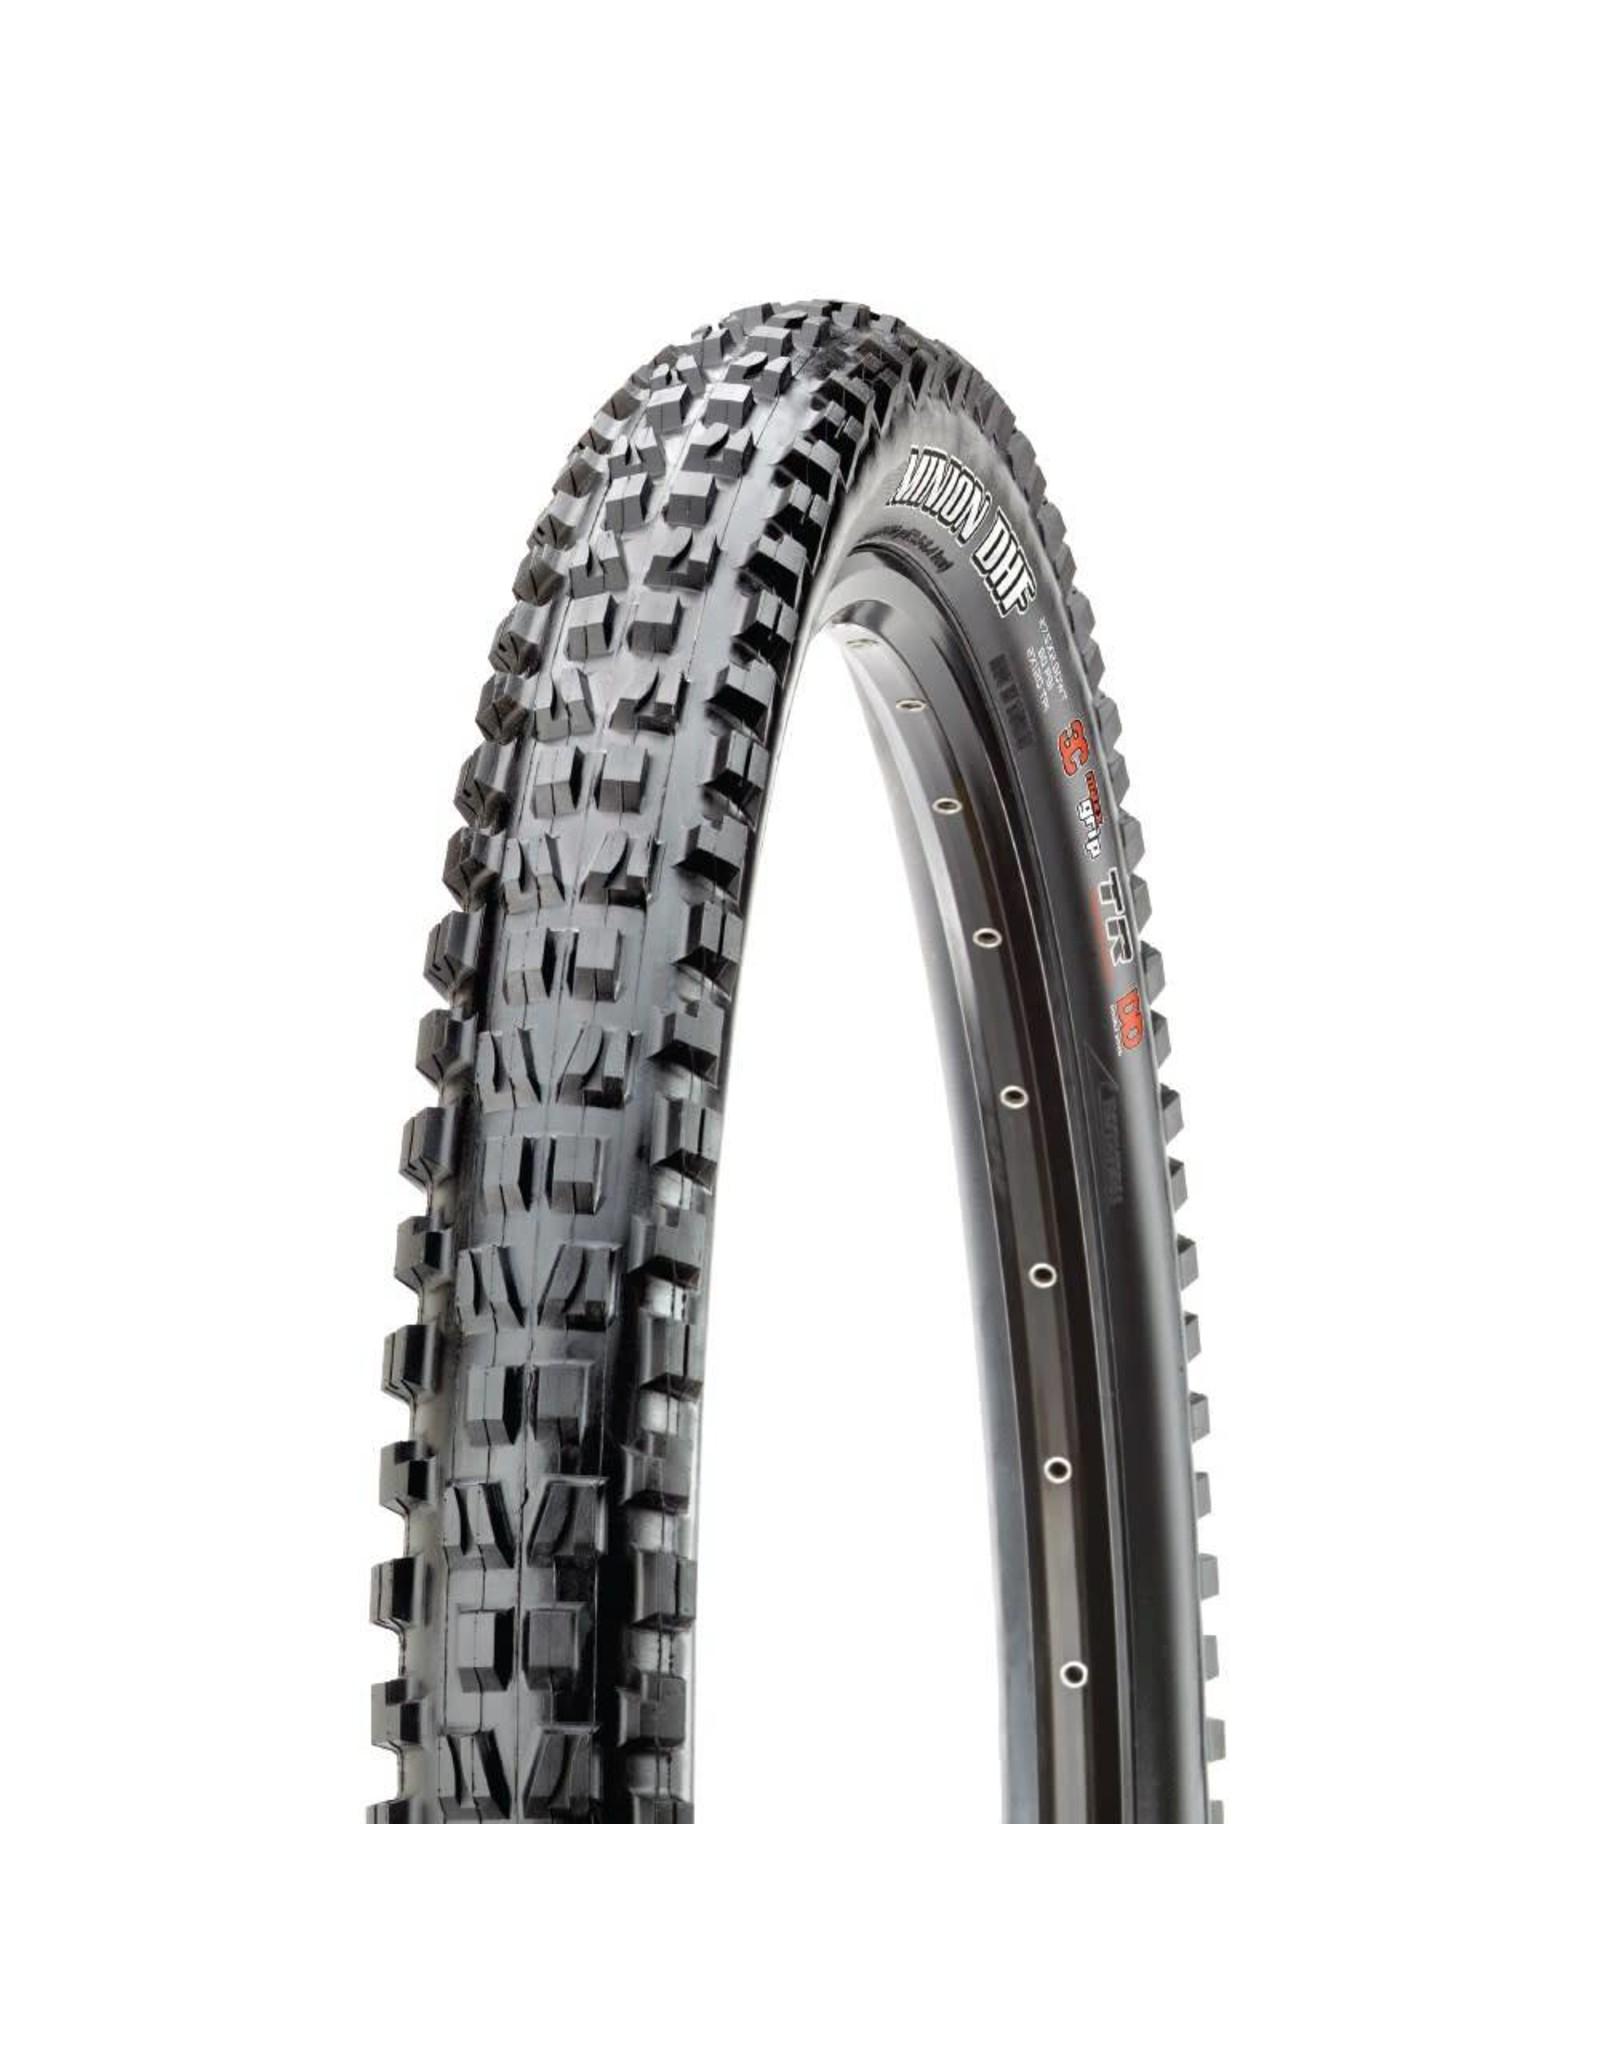 "Maxxis Maxxis Minion DHF Tire: 27.5 x 2.50"", Folding, 60tpi, 3C MaxxGrip, EXO, Tubeless Ready, Wide Trail, Black"